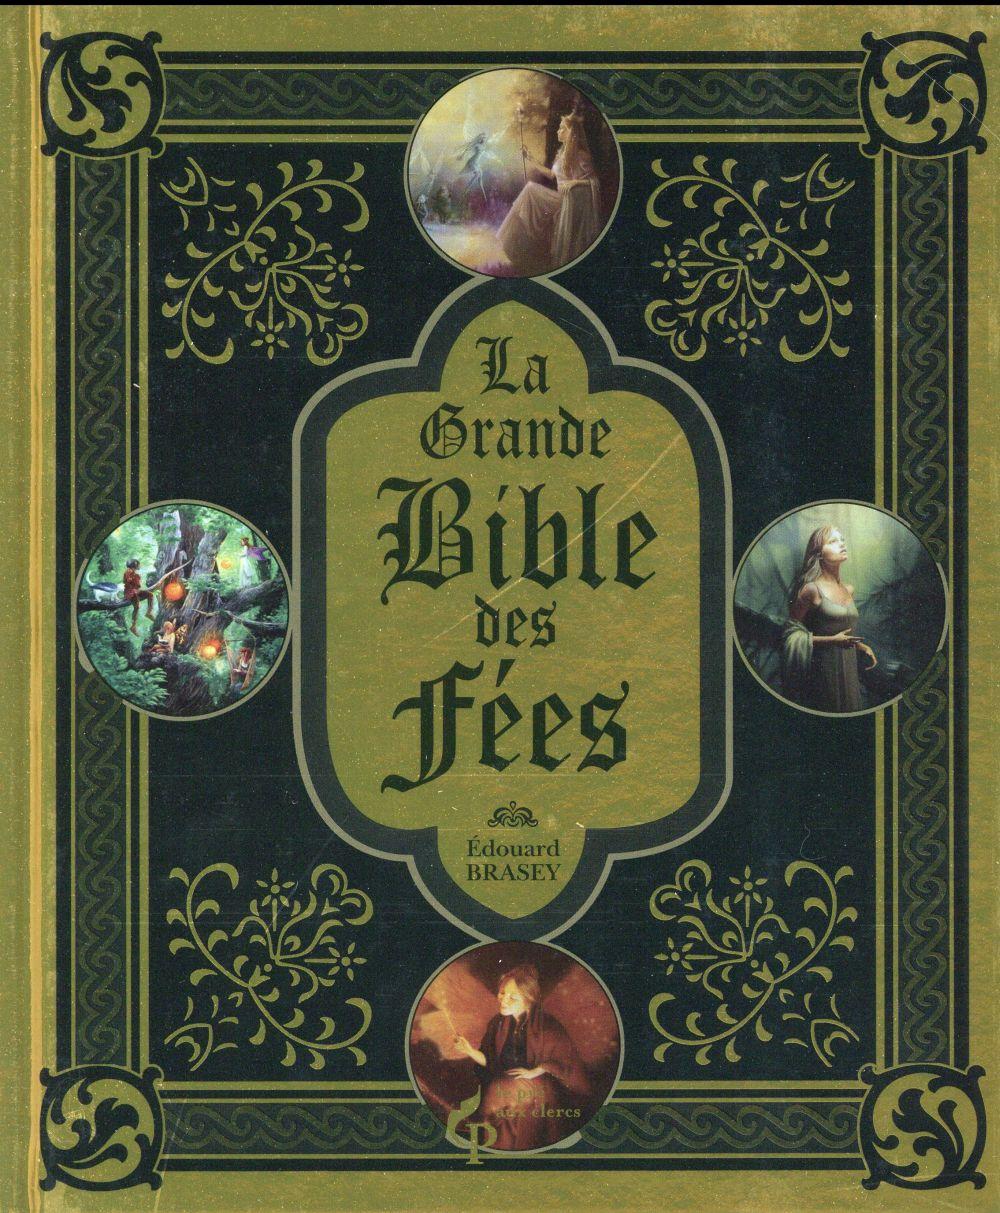 LA GRANDE BIBLE DES FEES